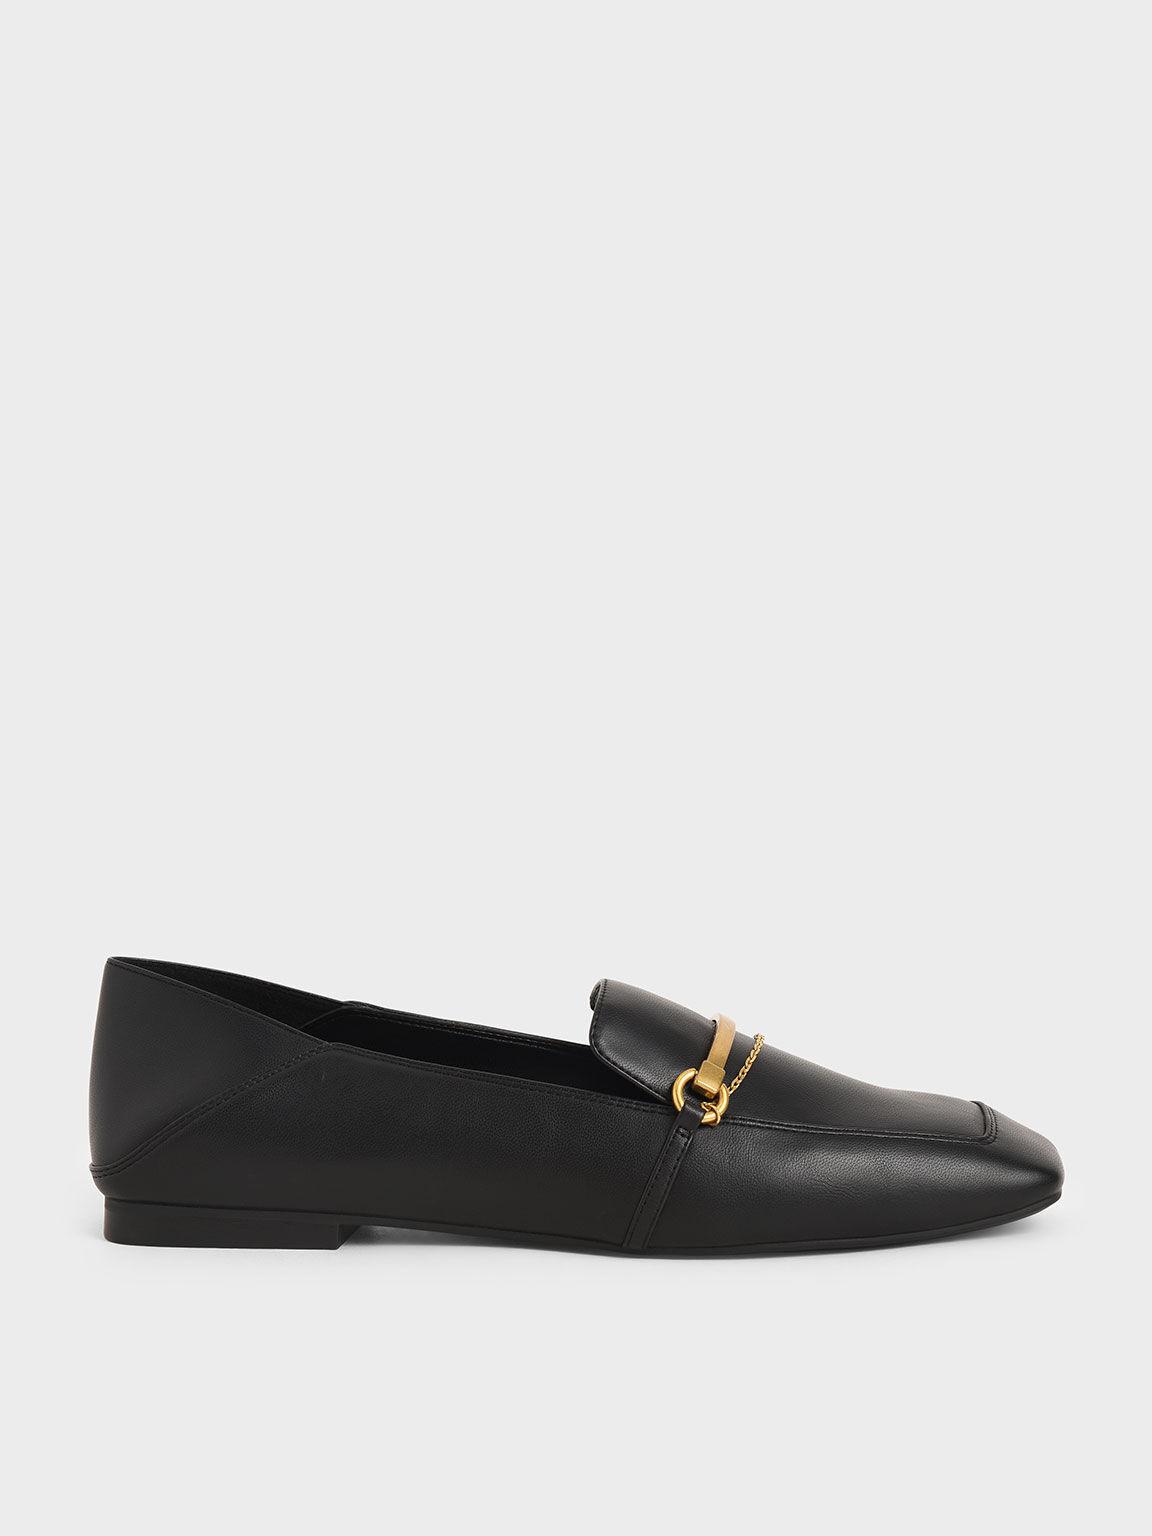 Metallic Accent Loafers, Black, hi-res